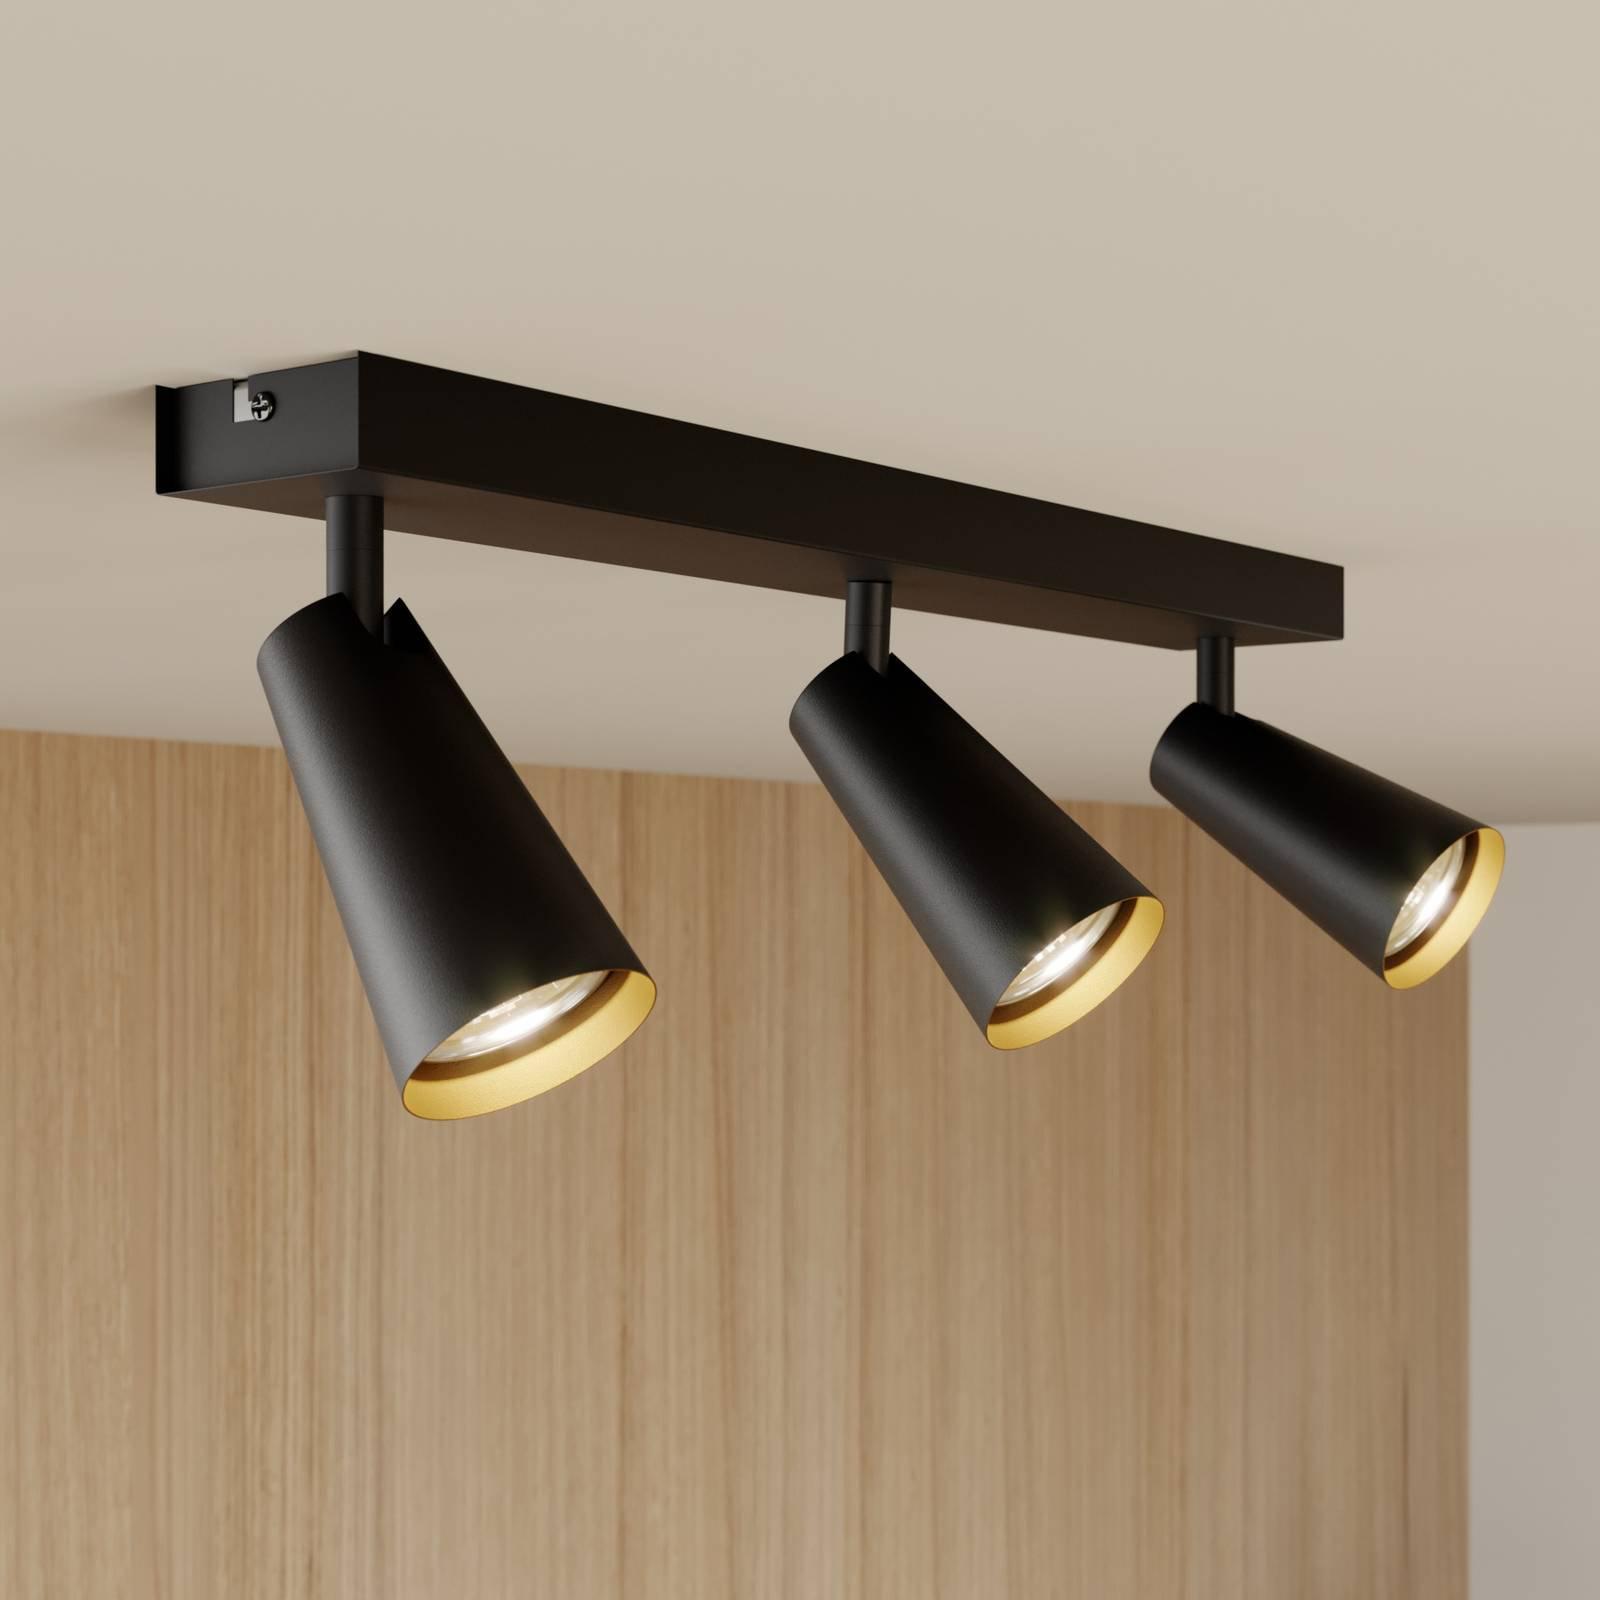 Lucande Angelina taklampe, svart-gull, 3 lyskilder